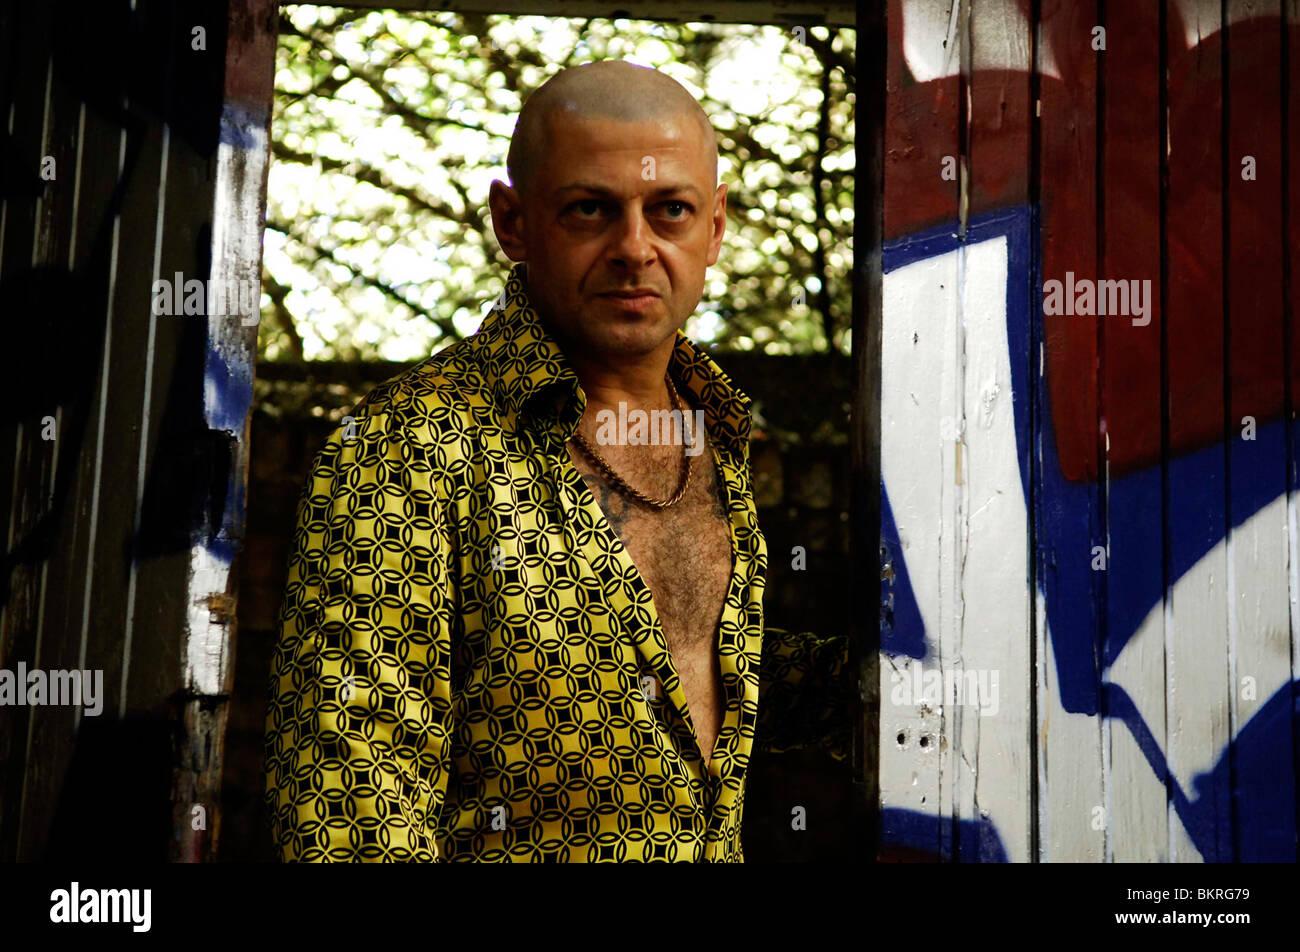 SUGARHOUSE (2007) ANDY SERKIS GARY LOVE (DIR) 001 - Stock Image